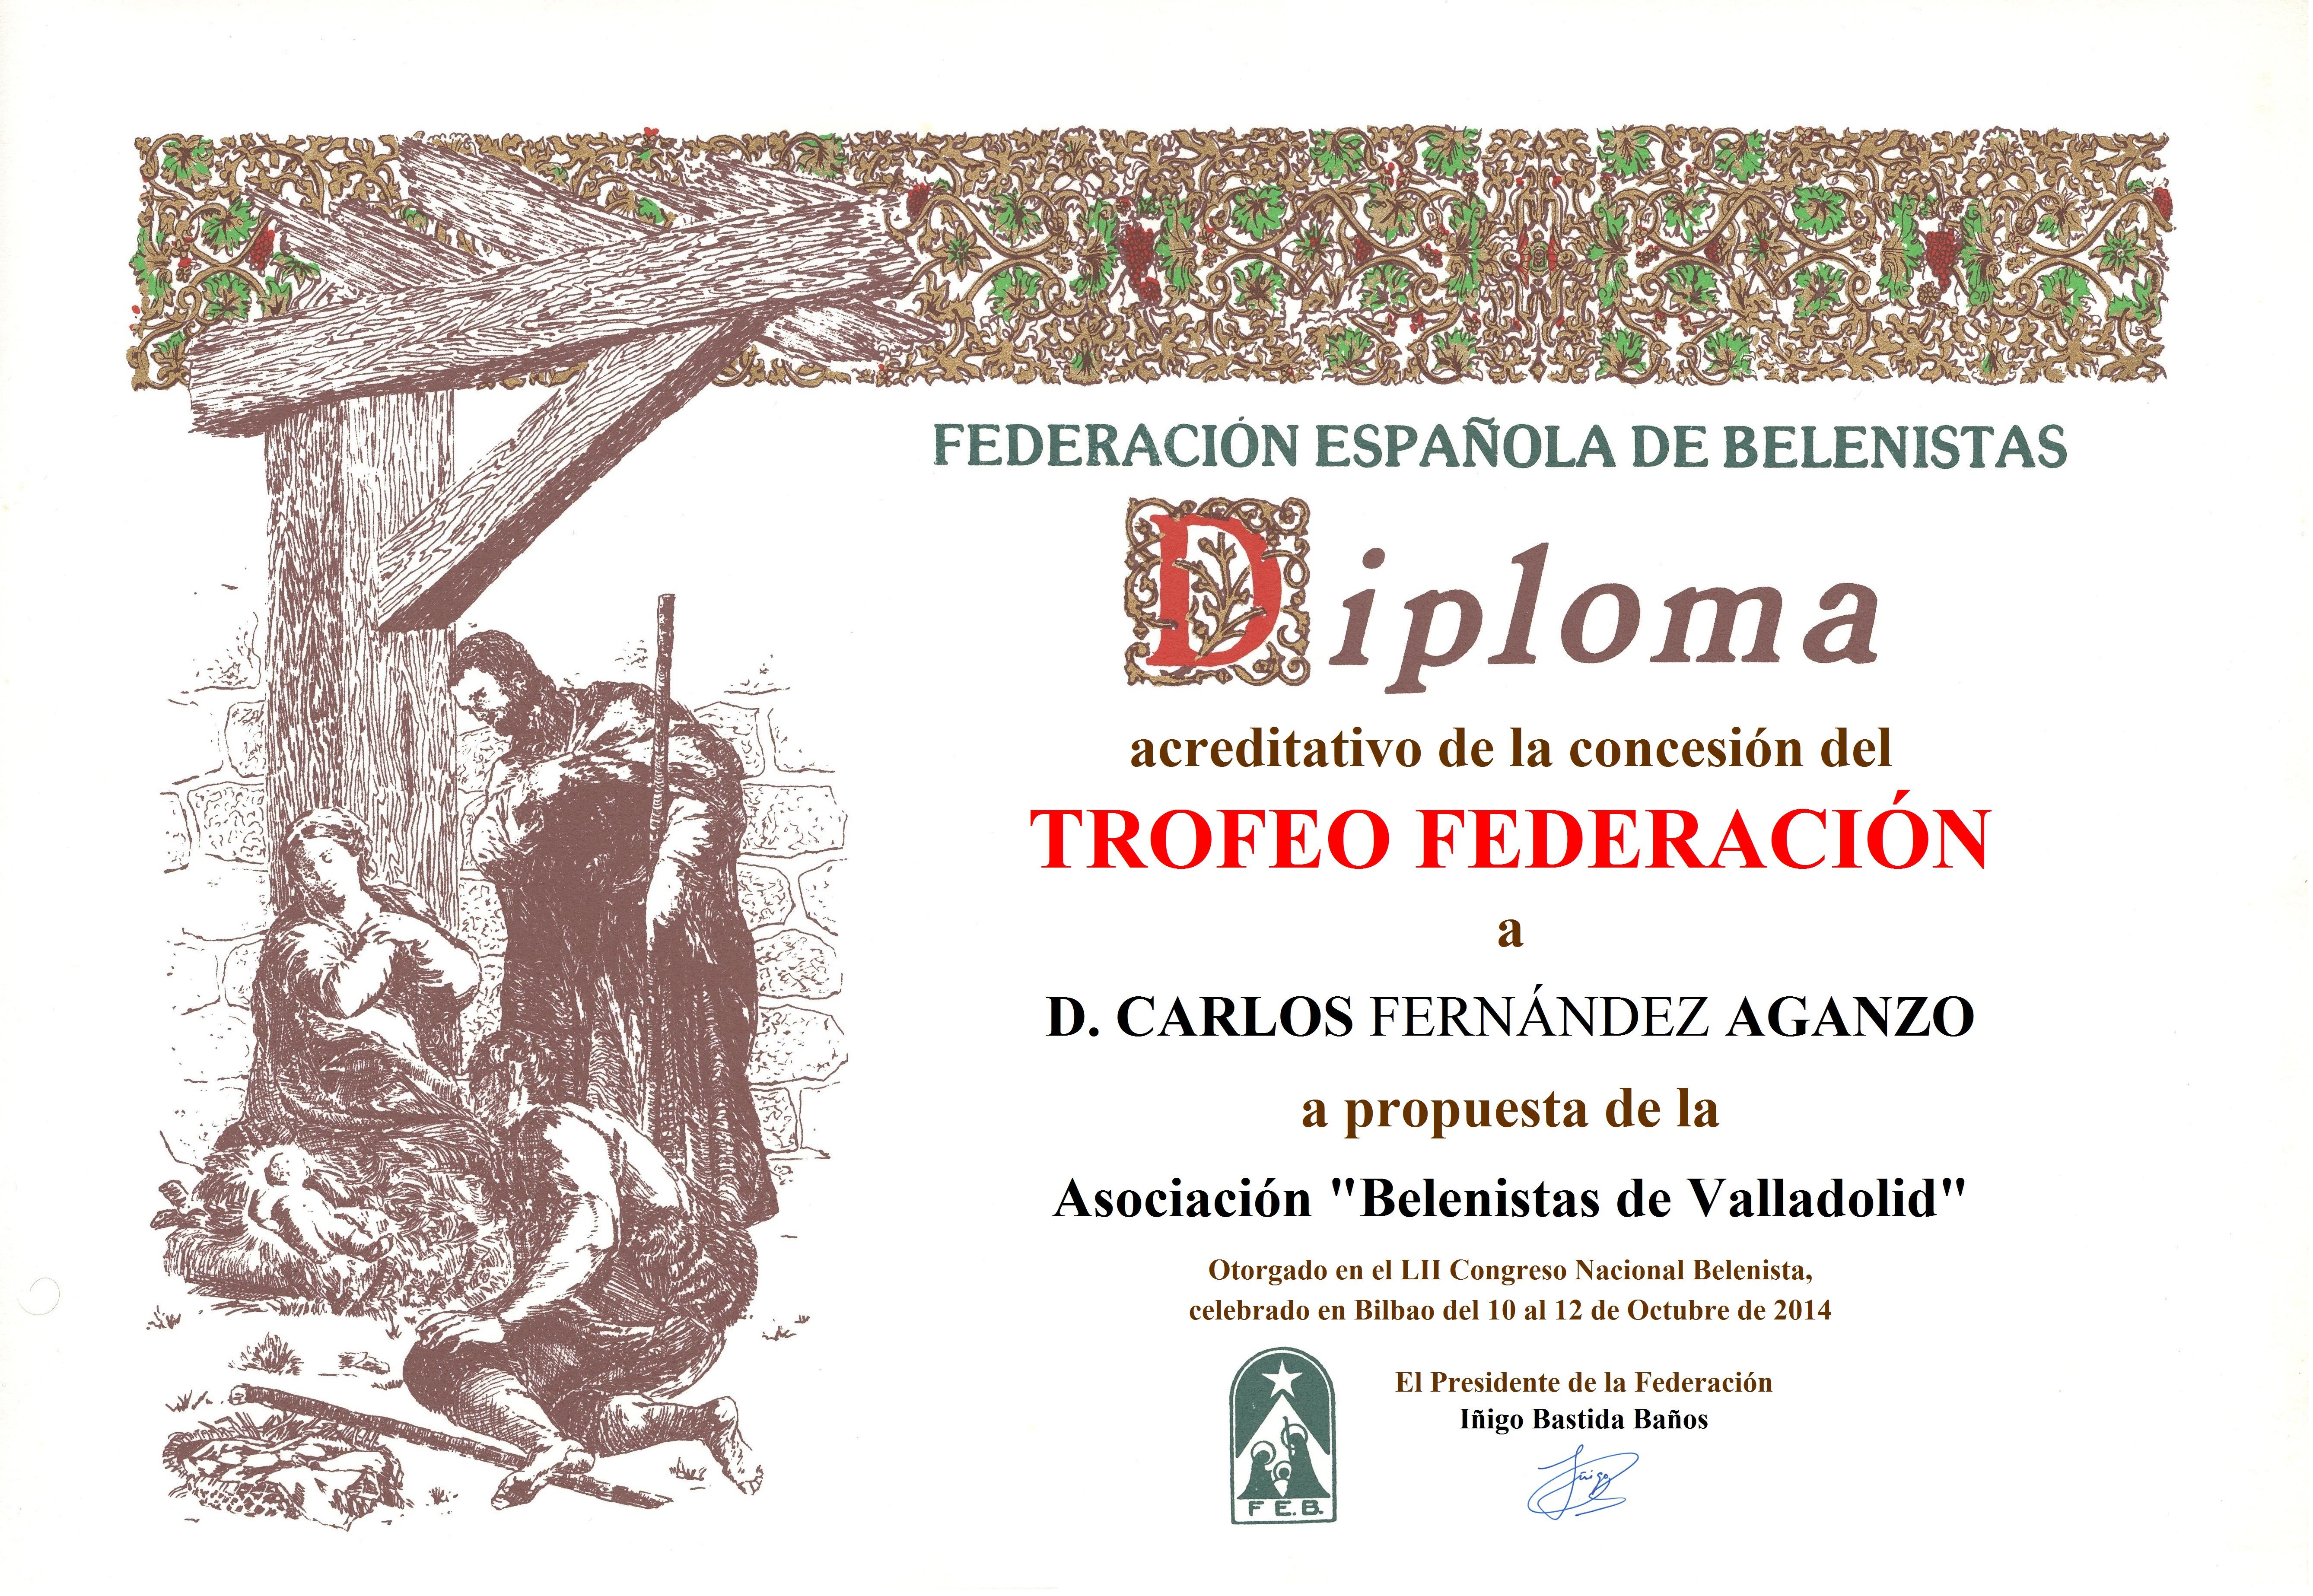 Diploma Trofeo FEB 2014 Carlos Fernández Aganzo